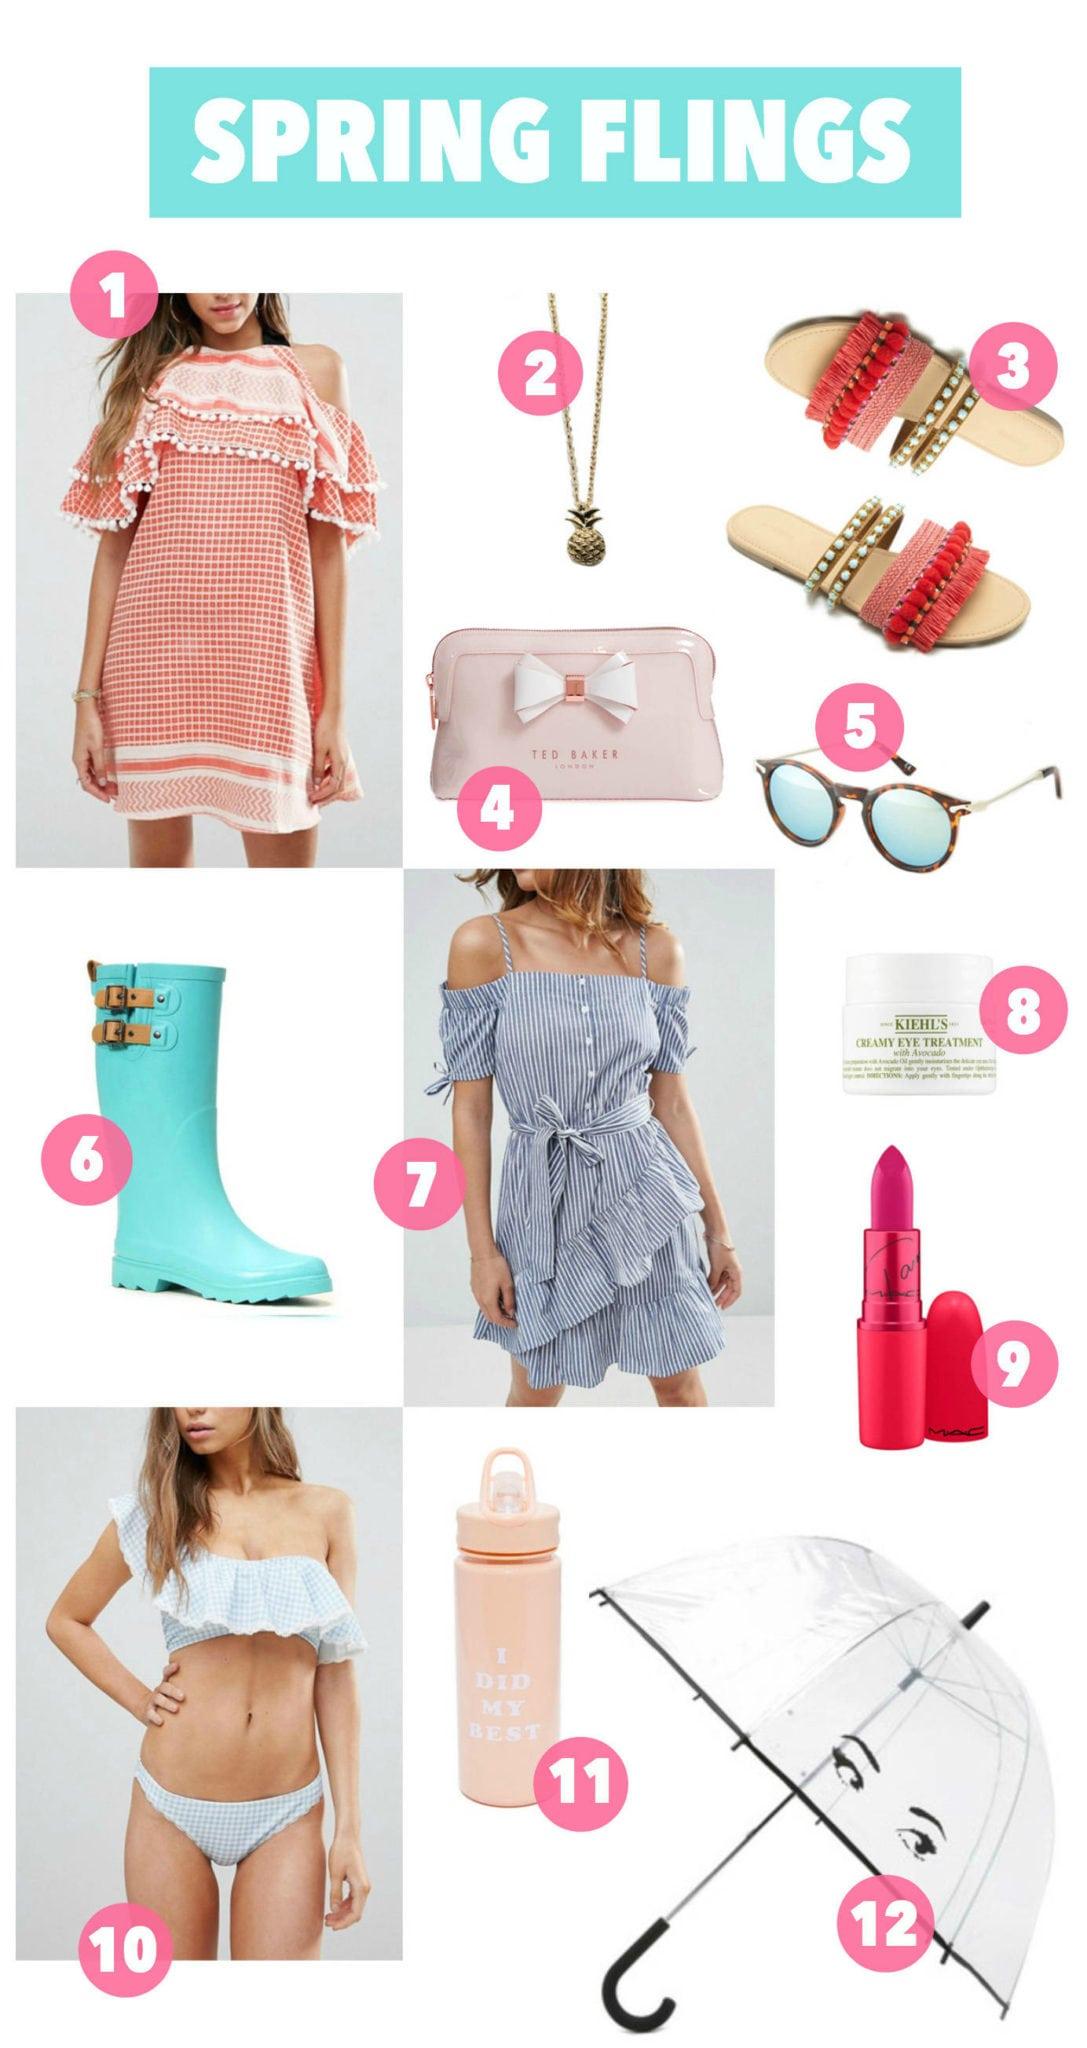 Spring flings on a budget   Mash Elle beauty blogger    boots   lipstick    umbrella   spring gifts